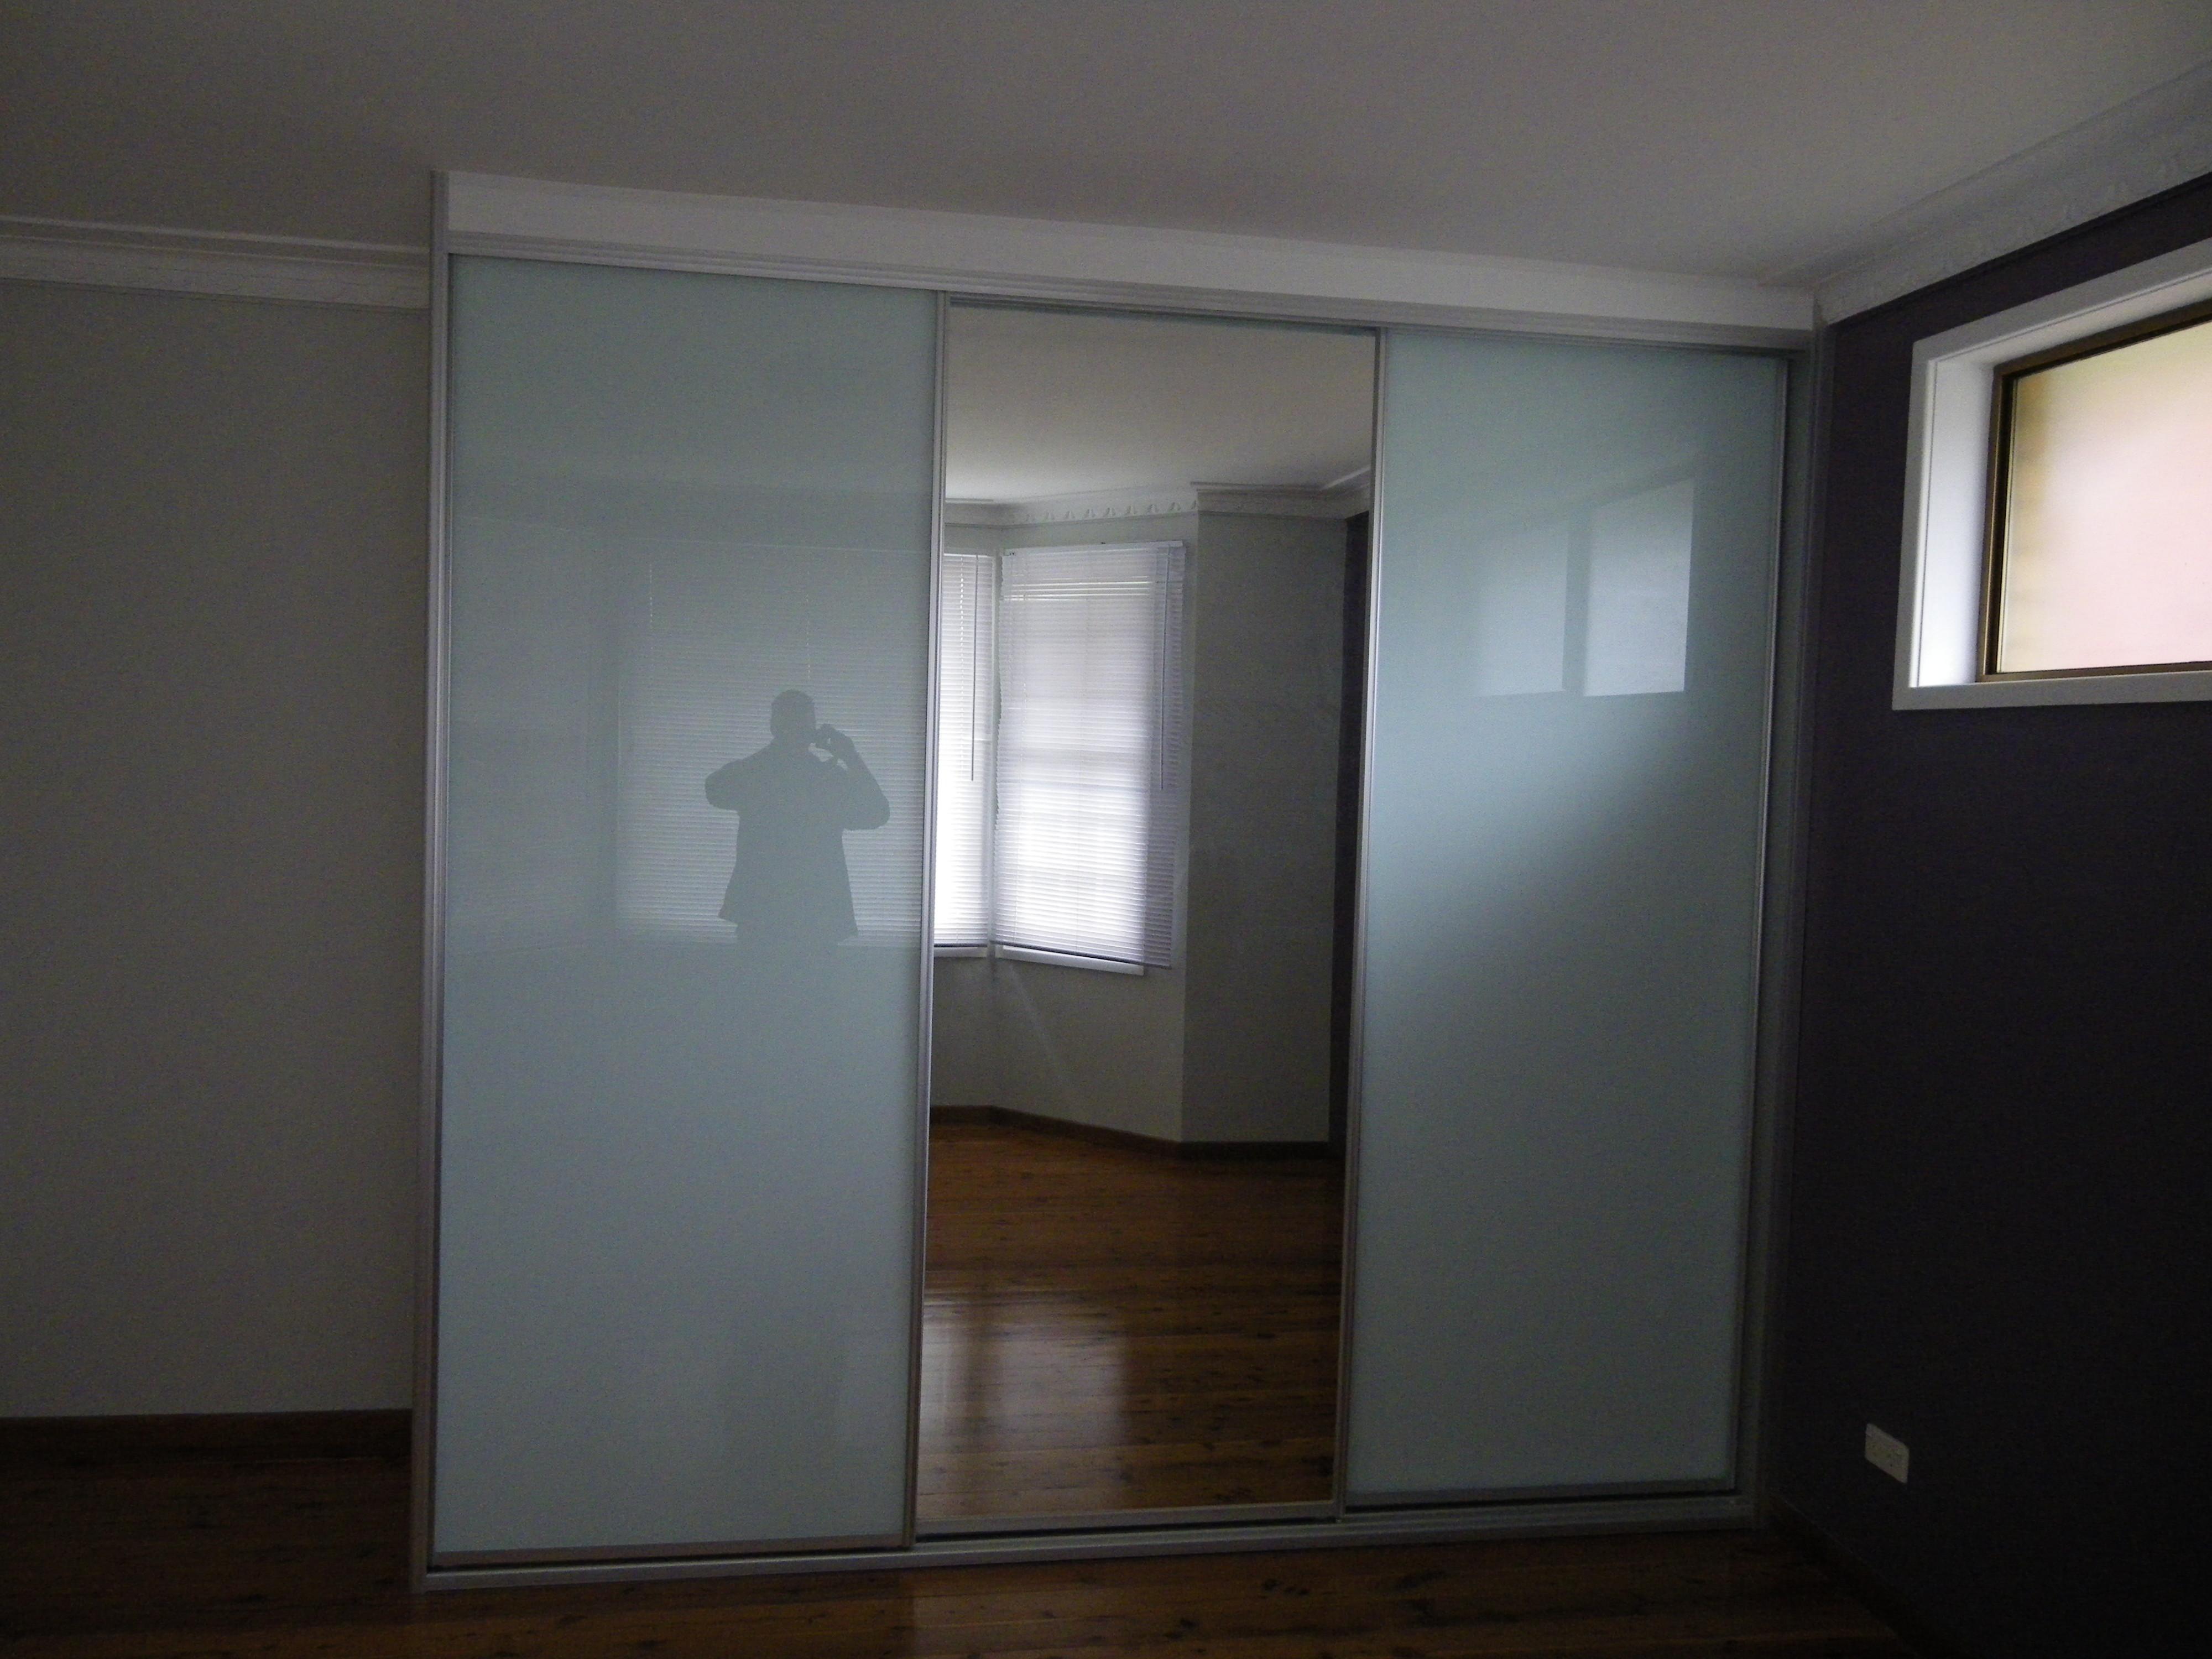 Home Decor Innovations Closet Doors 100 Mirrored Closet Sliding Doors 28 Images 100 Home